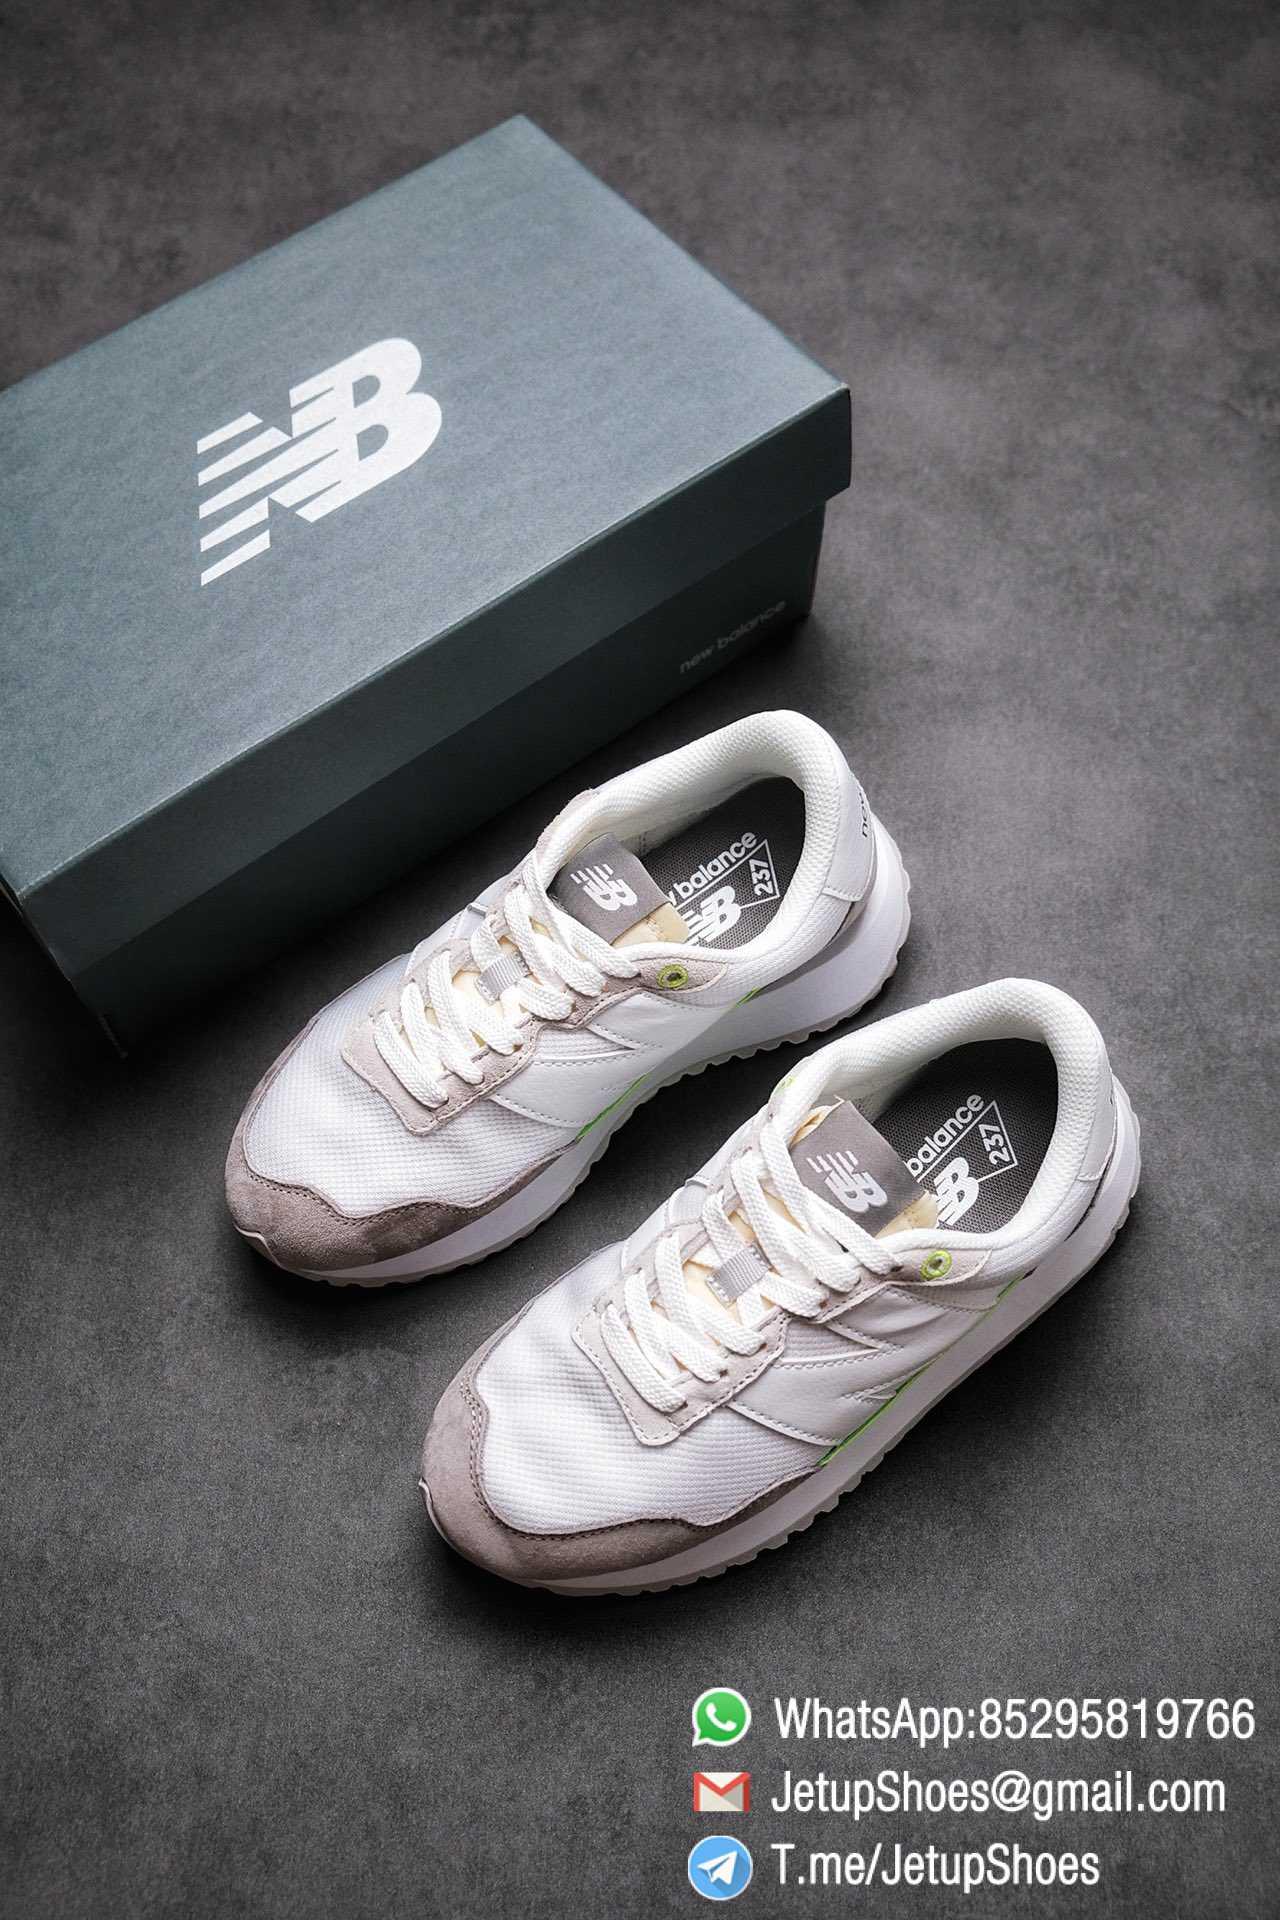 Best Replica New Balance 237 Niko x 237 Grey Green SKU MS237SL1 High Quality Fake Sneakers 04